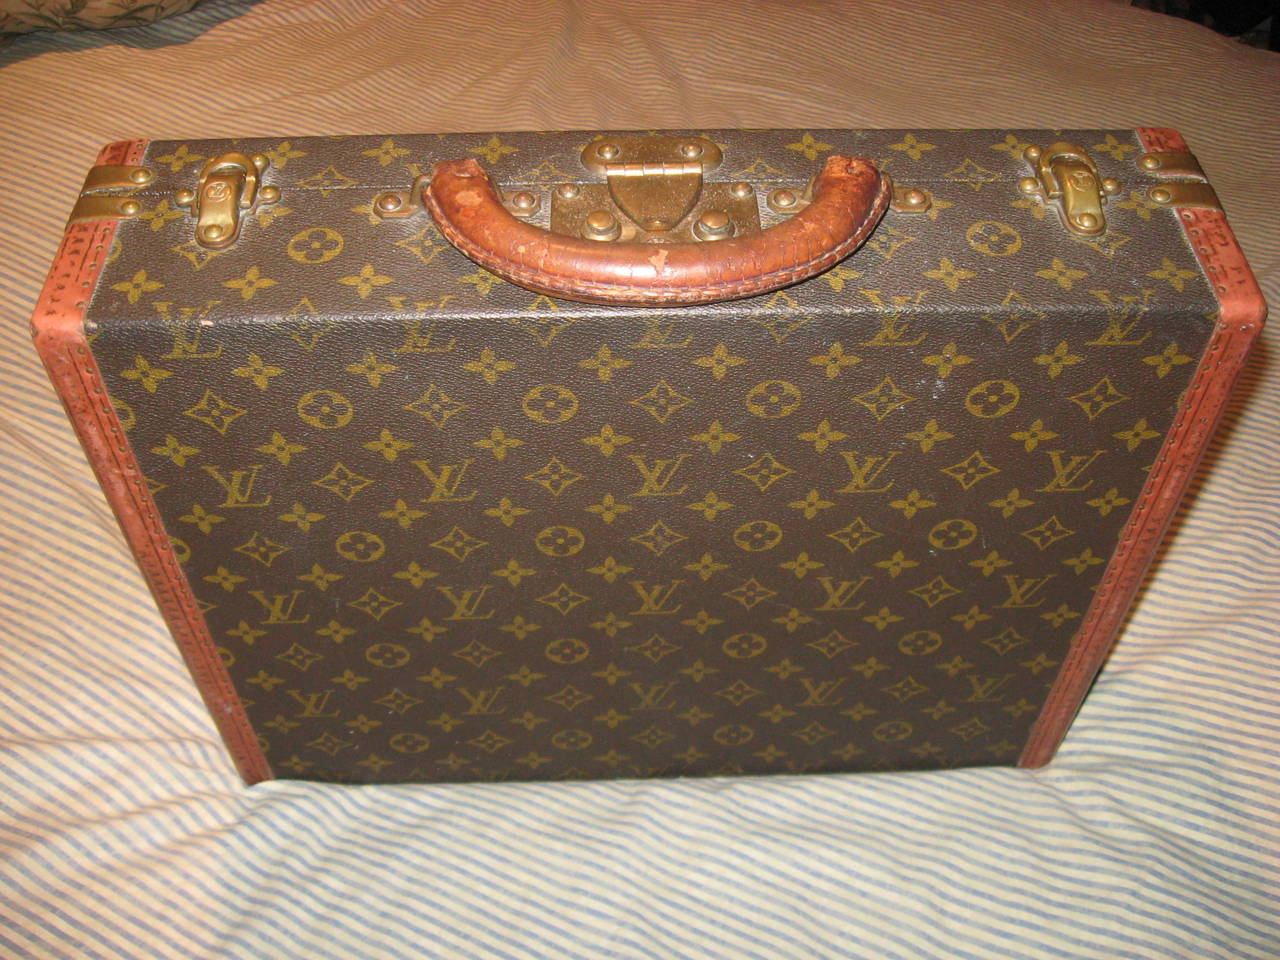 244b13d455fc Louis Vuitton Vintage Briefcase at 1stdibs